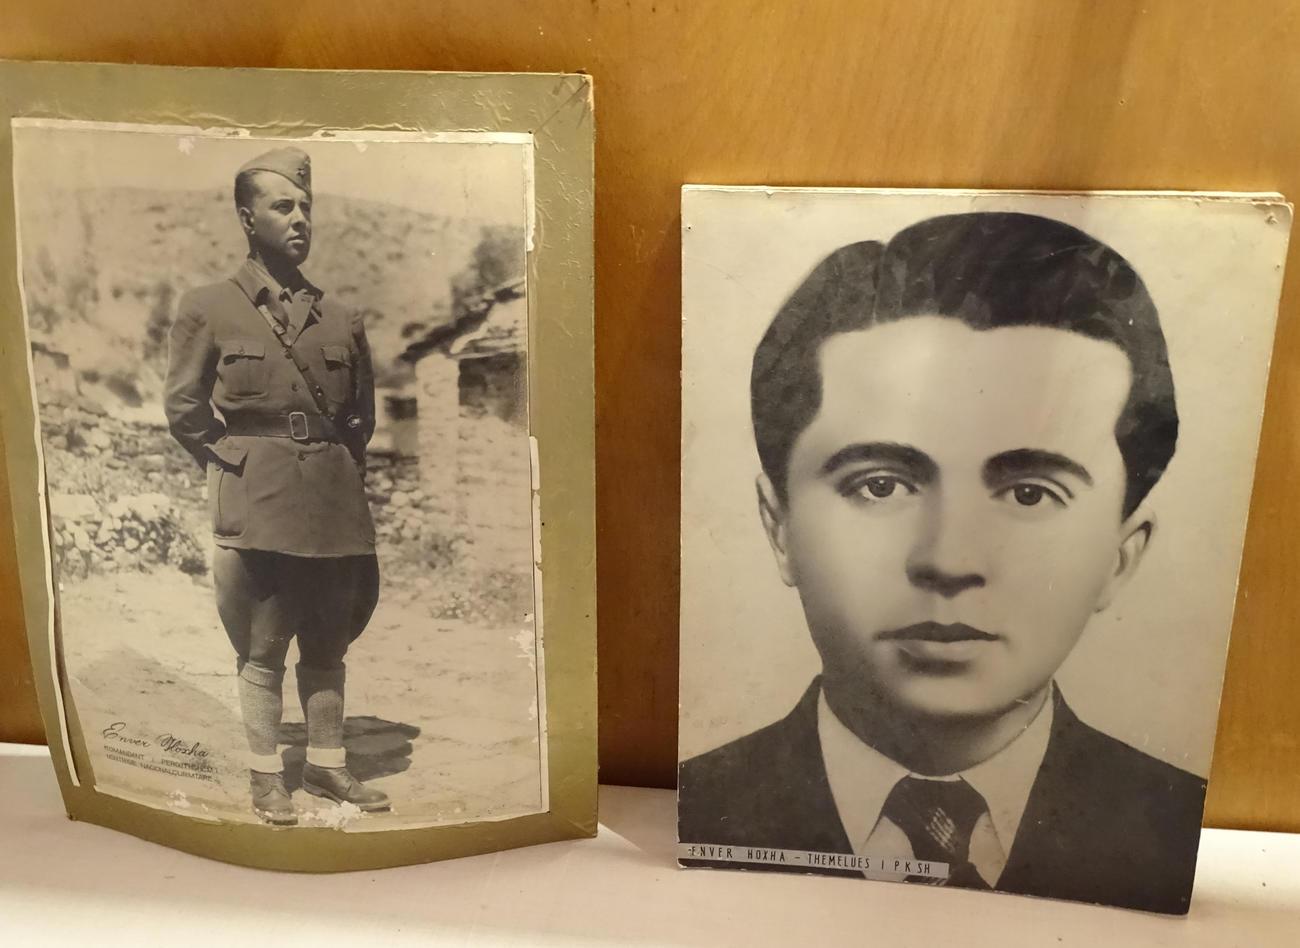 Enver Hoxha